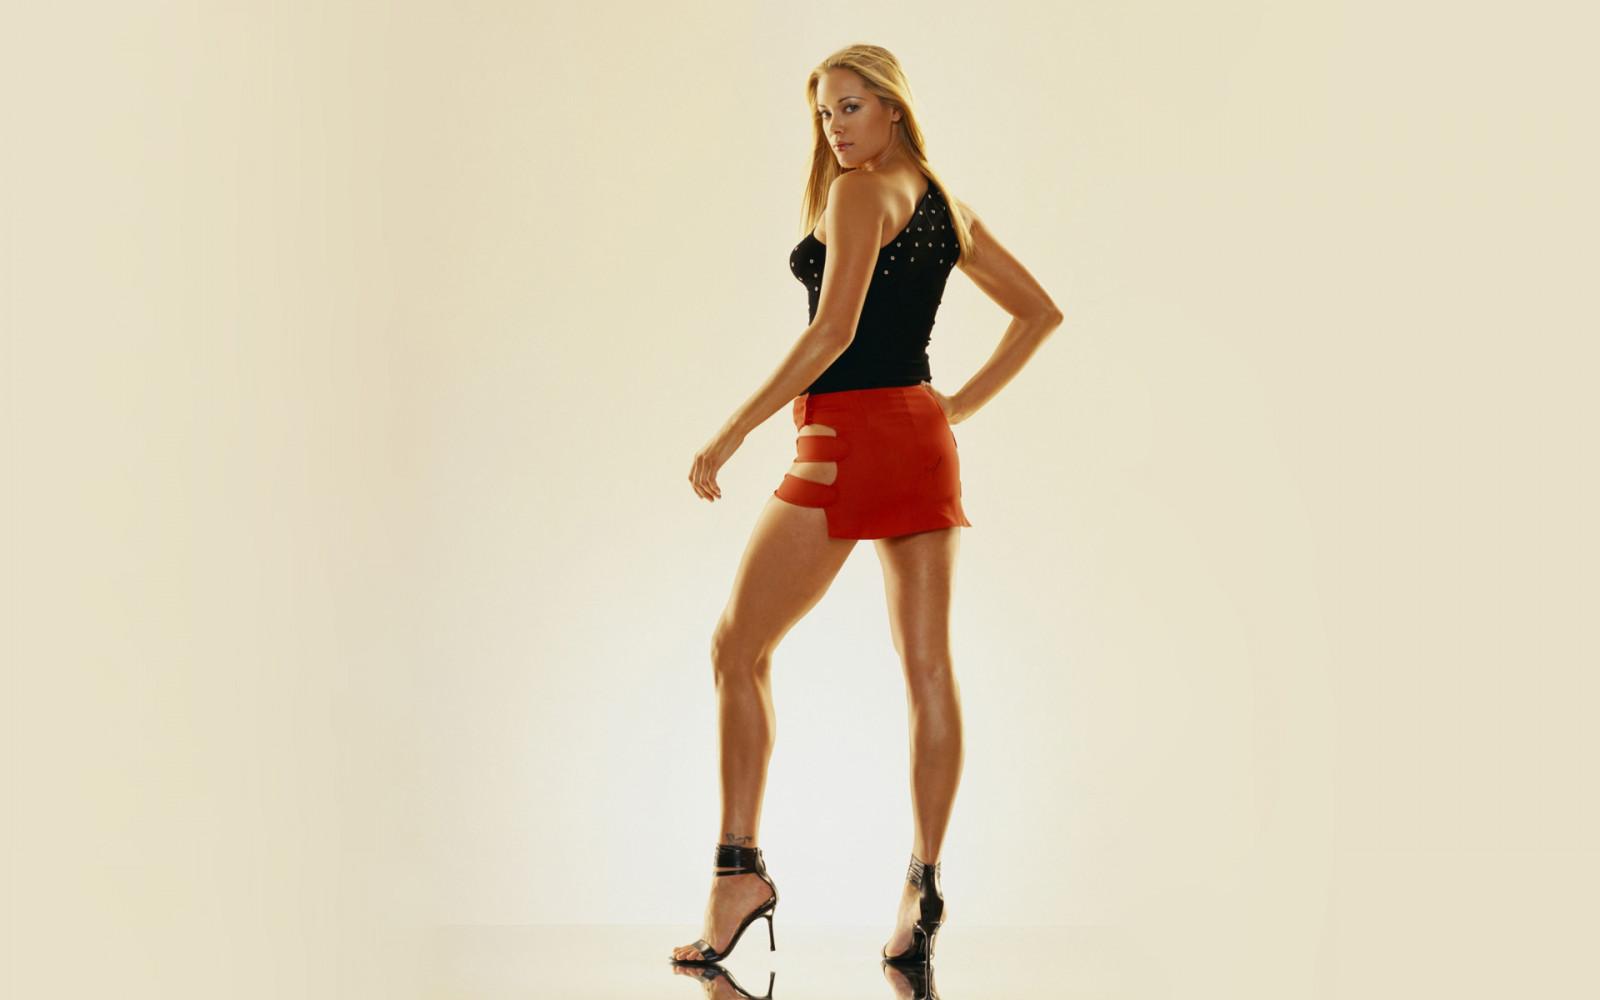 kristanna-loken-legs-boys-humping-girls-naked-hard